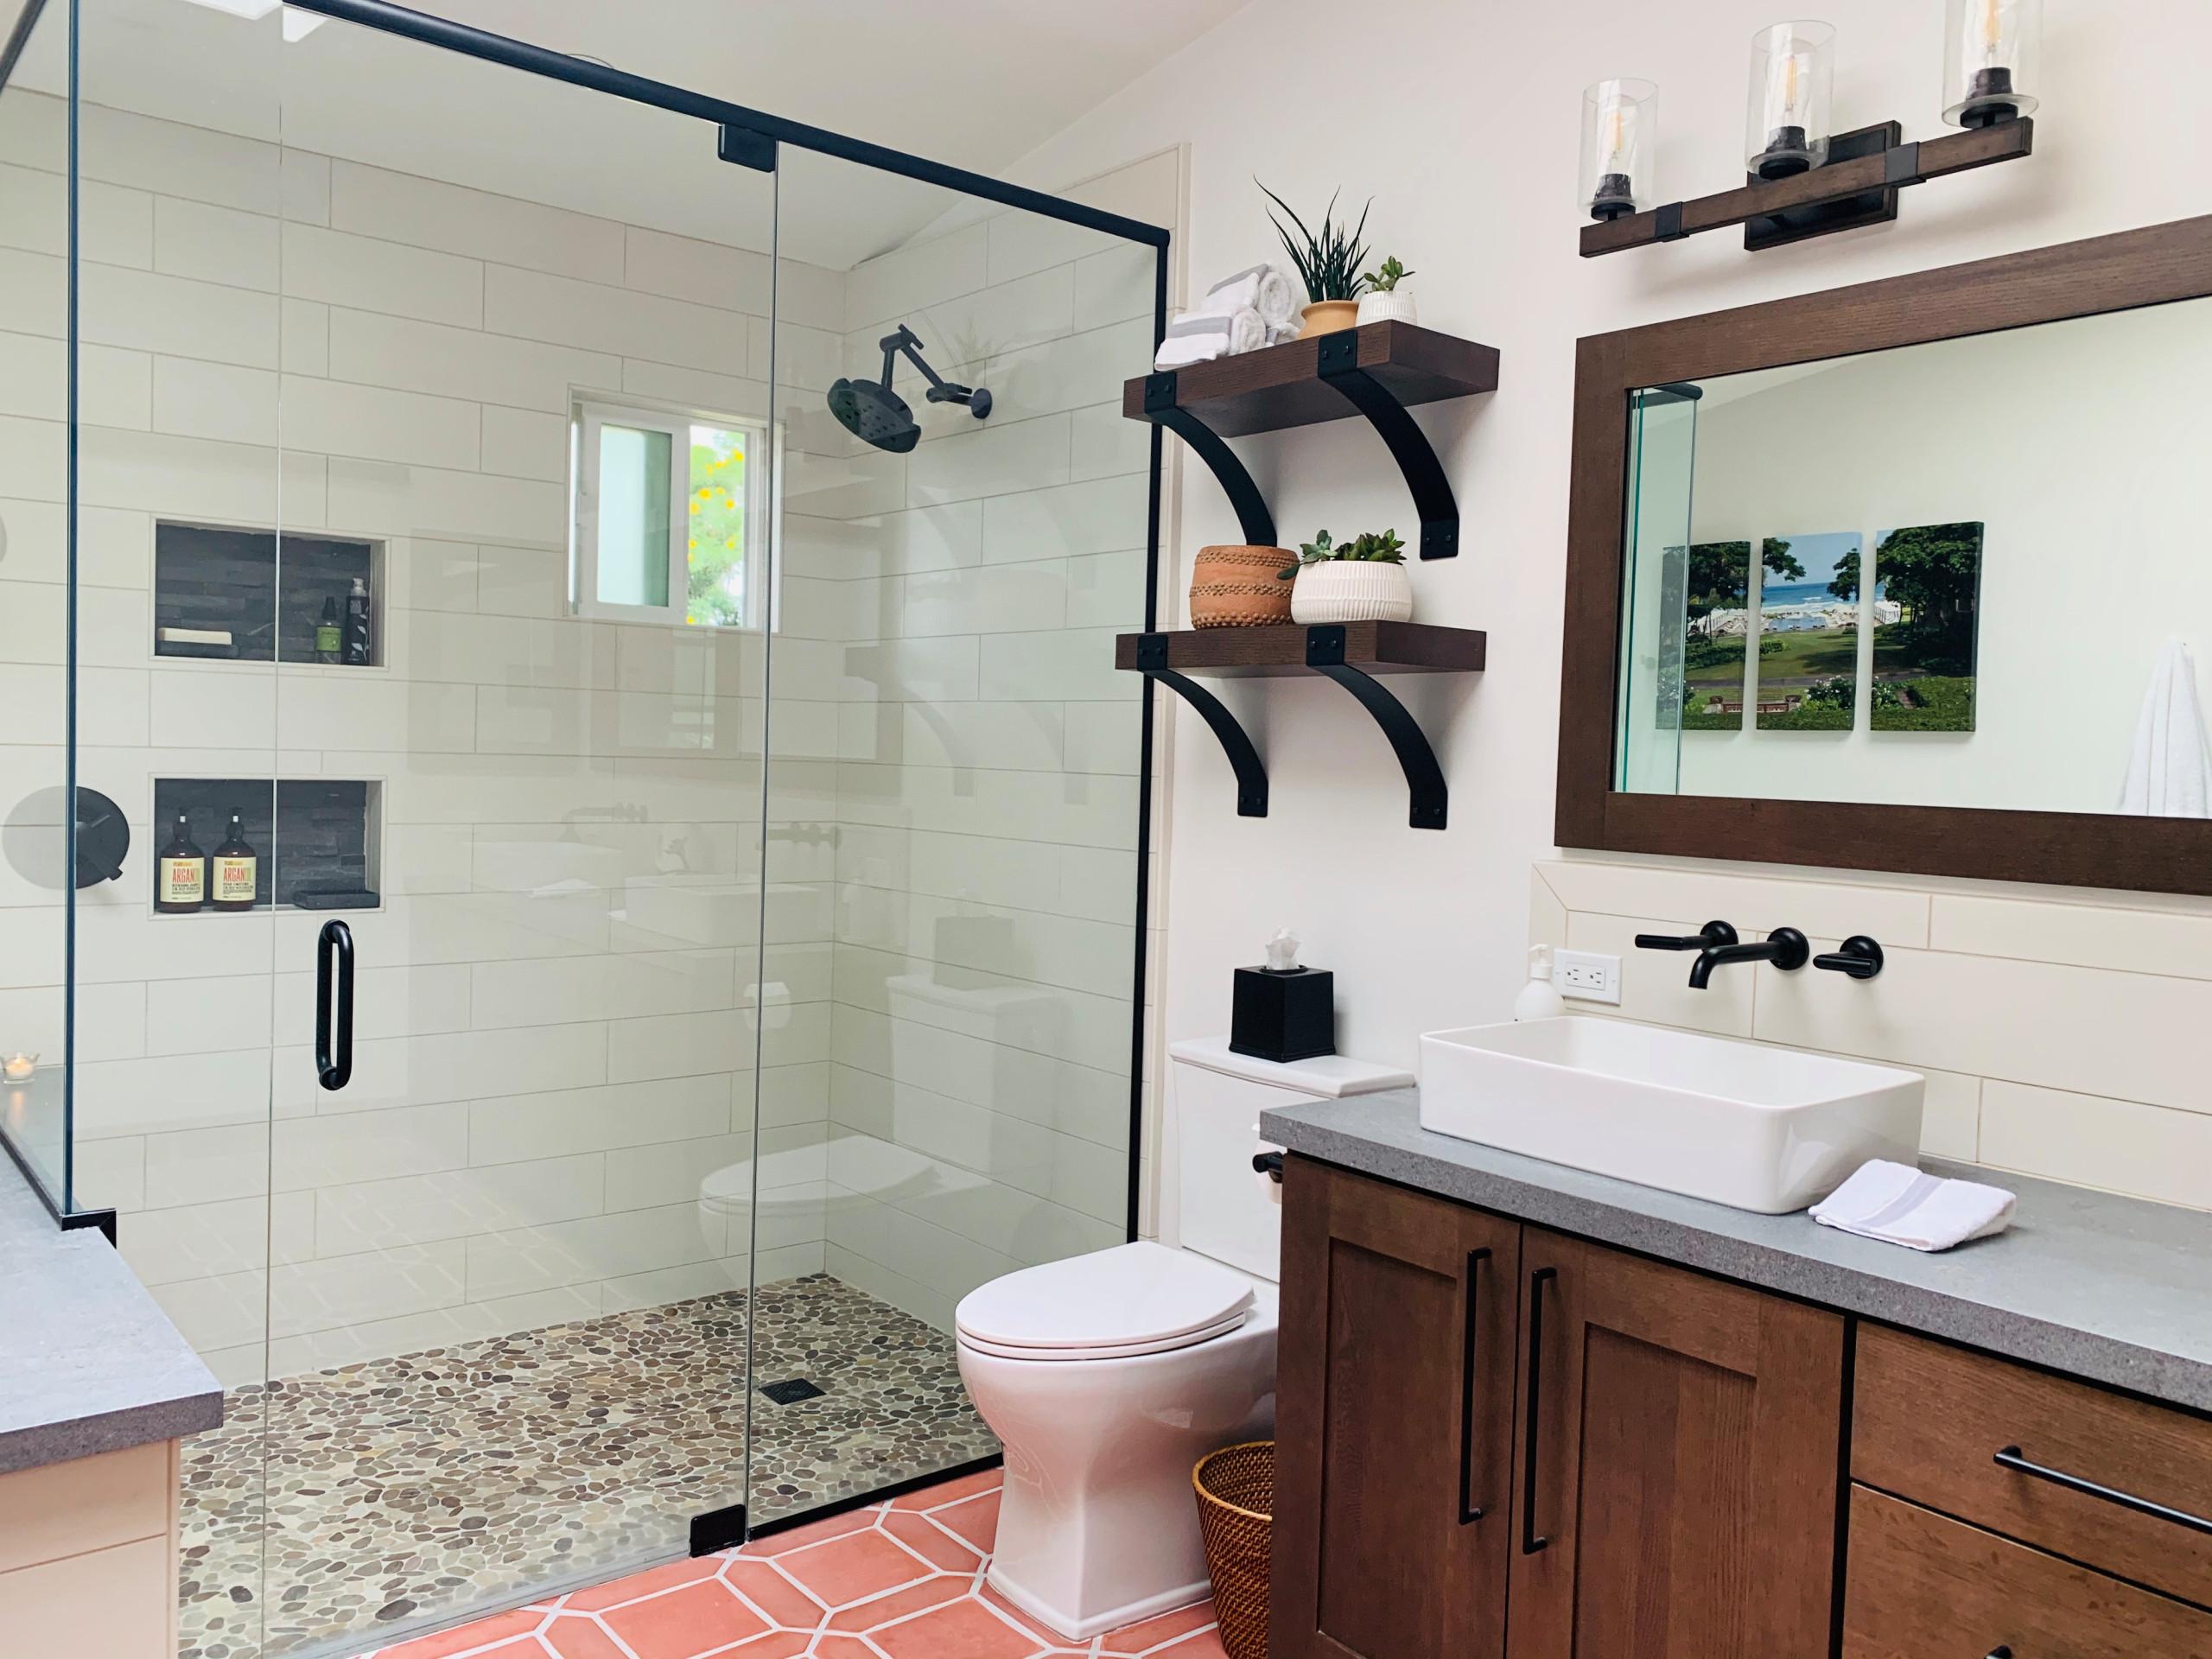 Solana Beach Tranquil Master Suite & Fun Kid's Bathroom Remodels